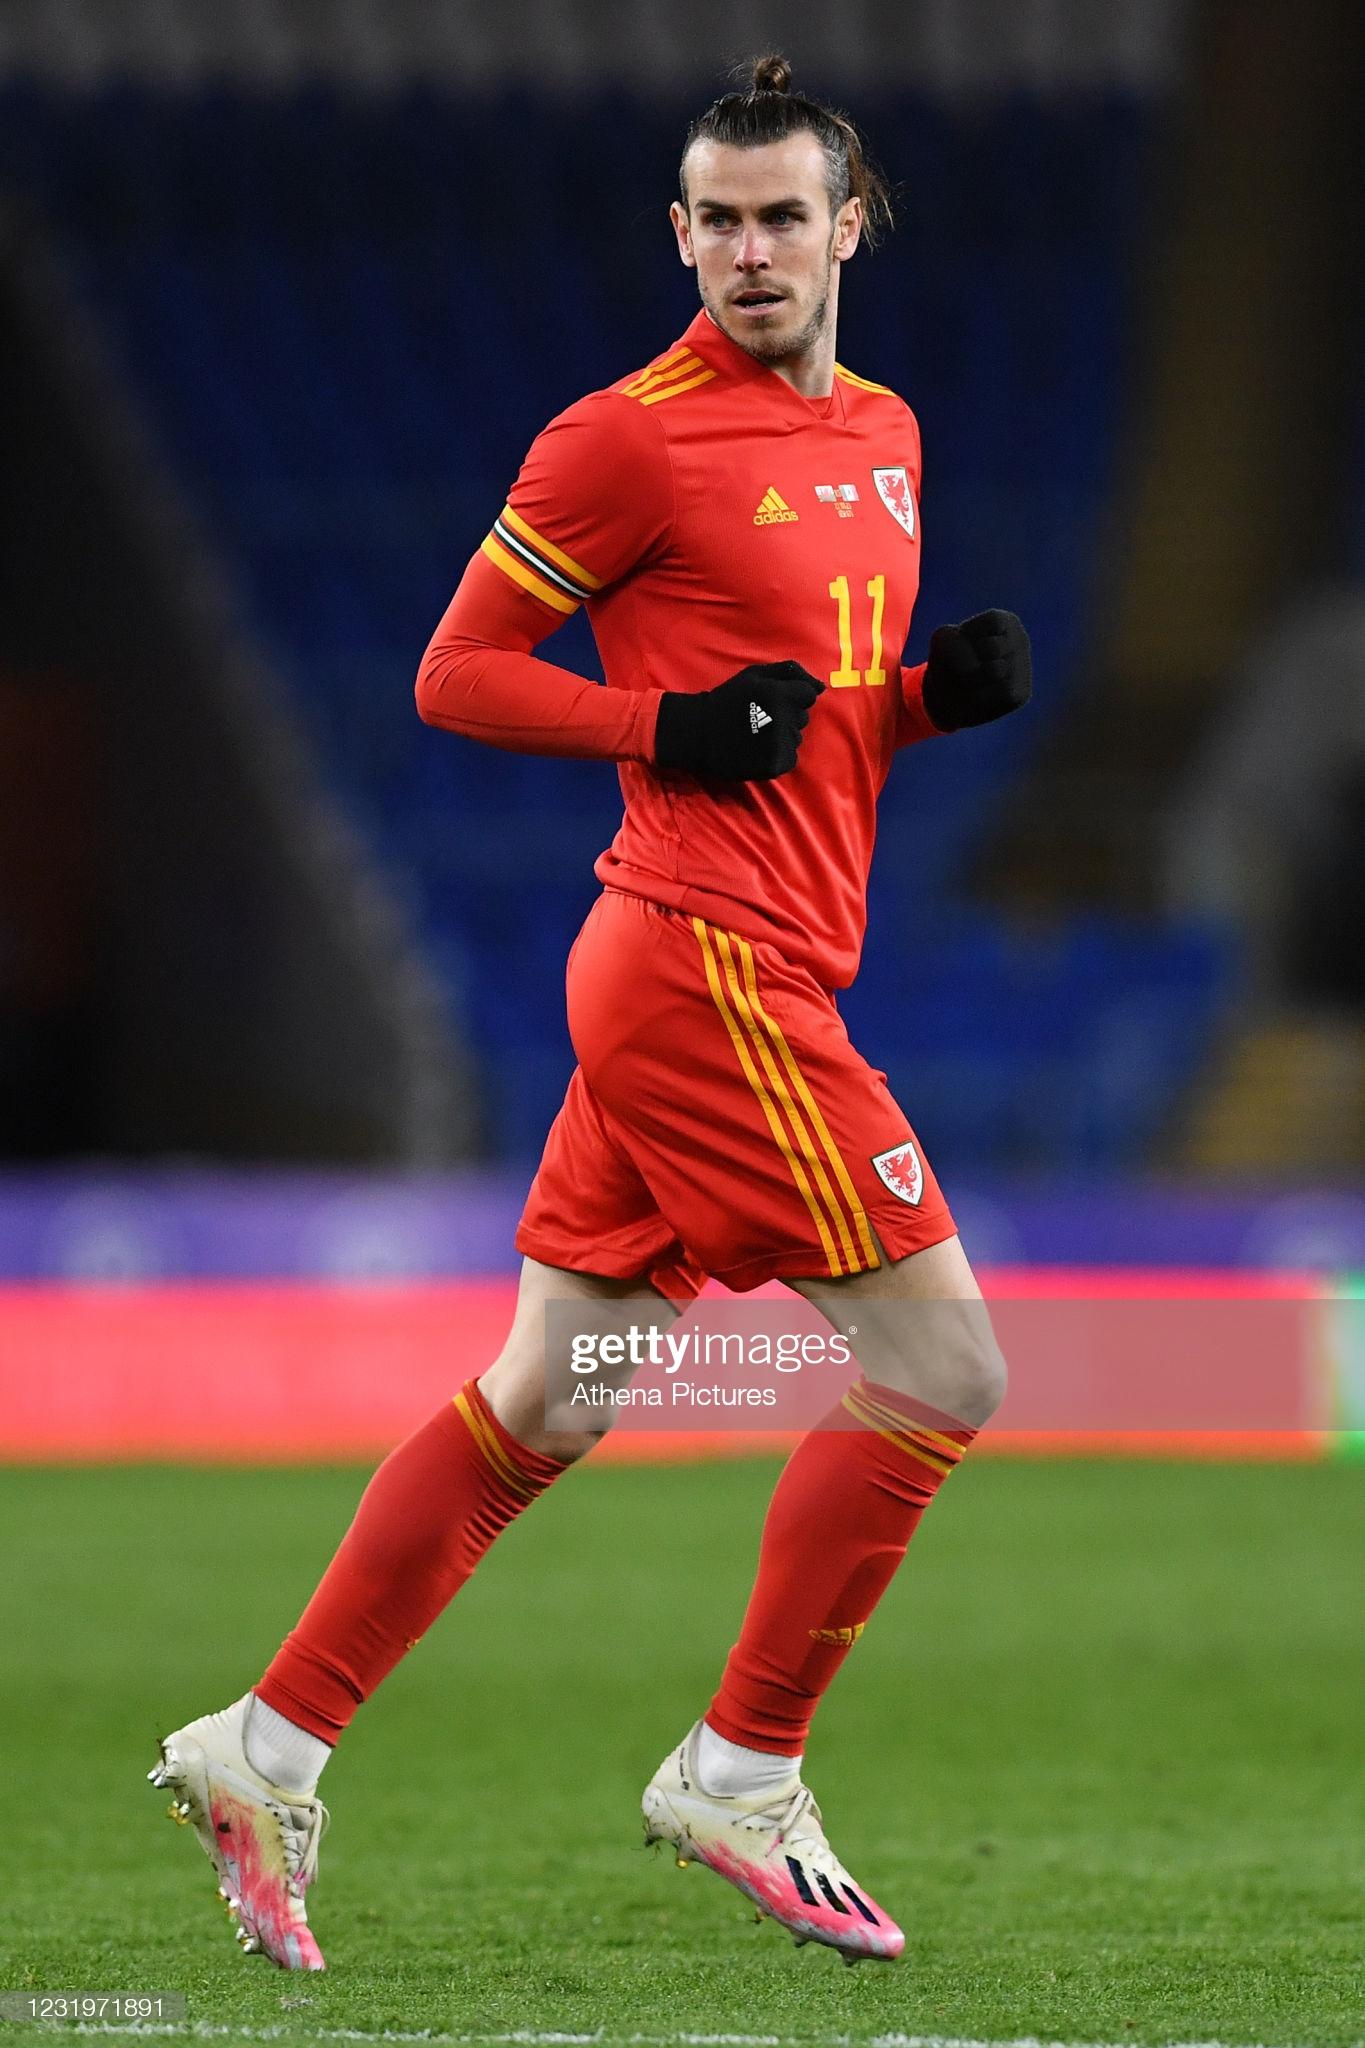 [Image: CARDIFF-WALES-MARCH-27-Gareth-Bale-of-Wa...les-an.jpg]